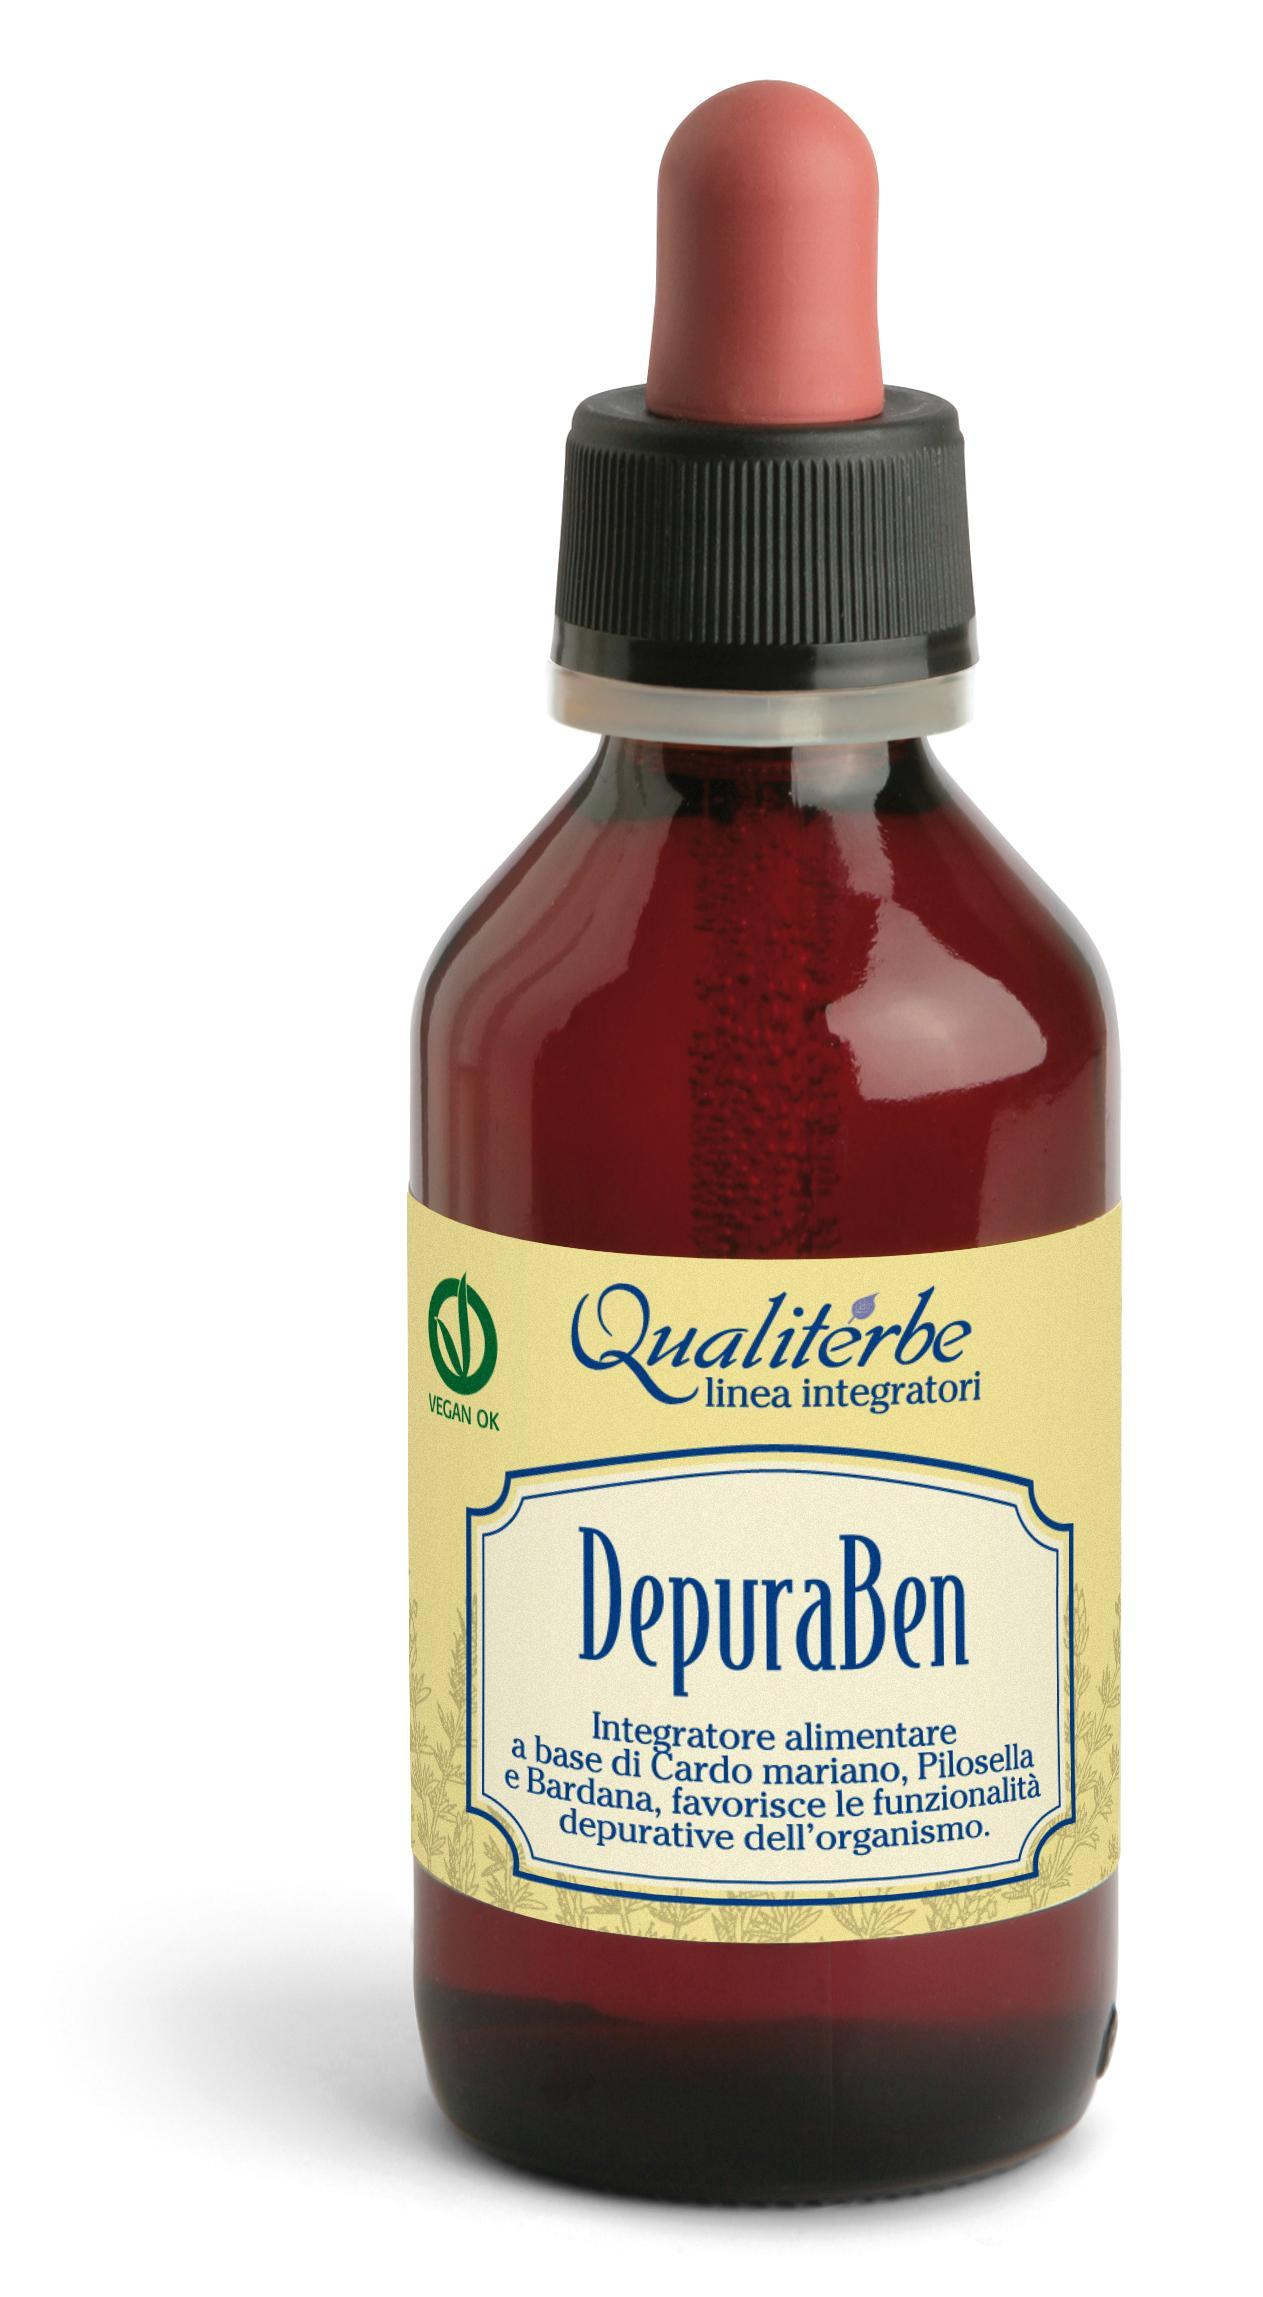 DepuraBen